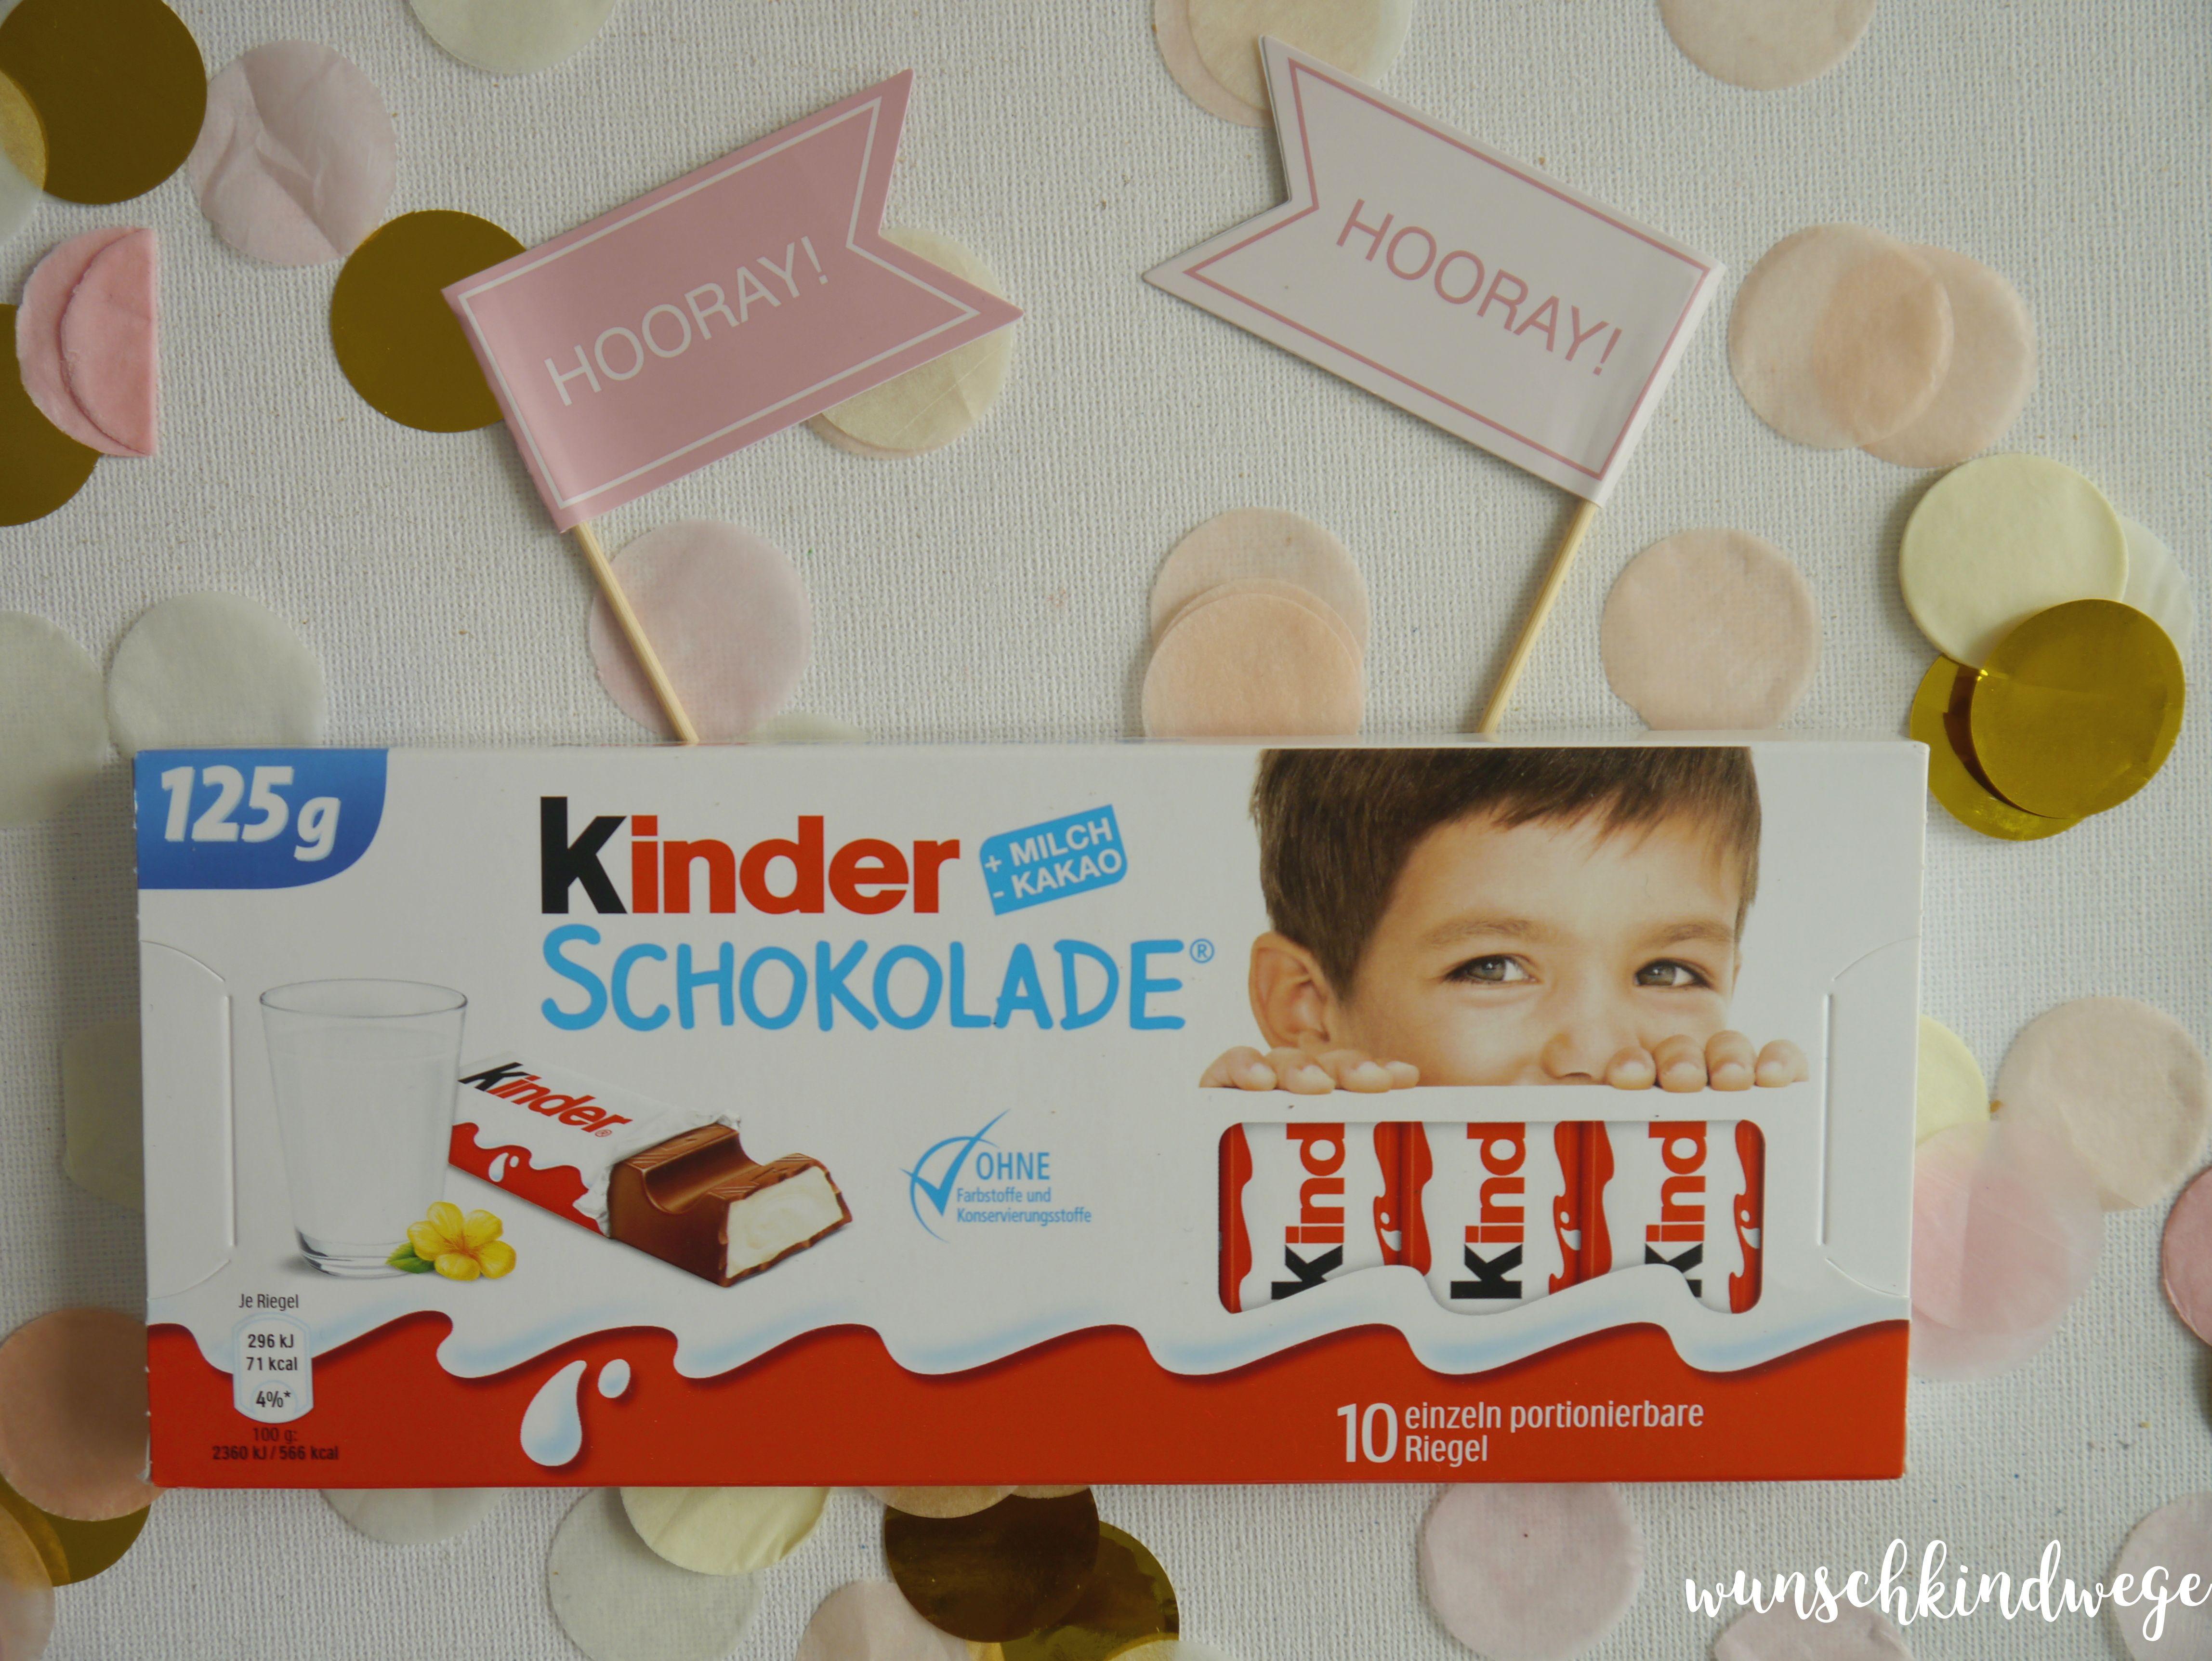 kinder Schokolade neue Verpackung